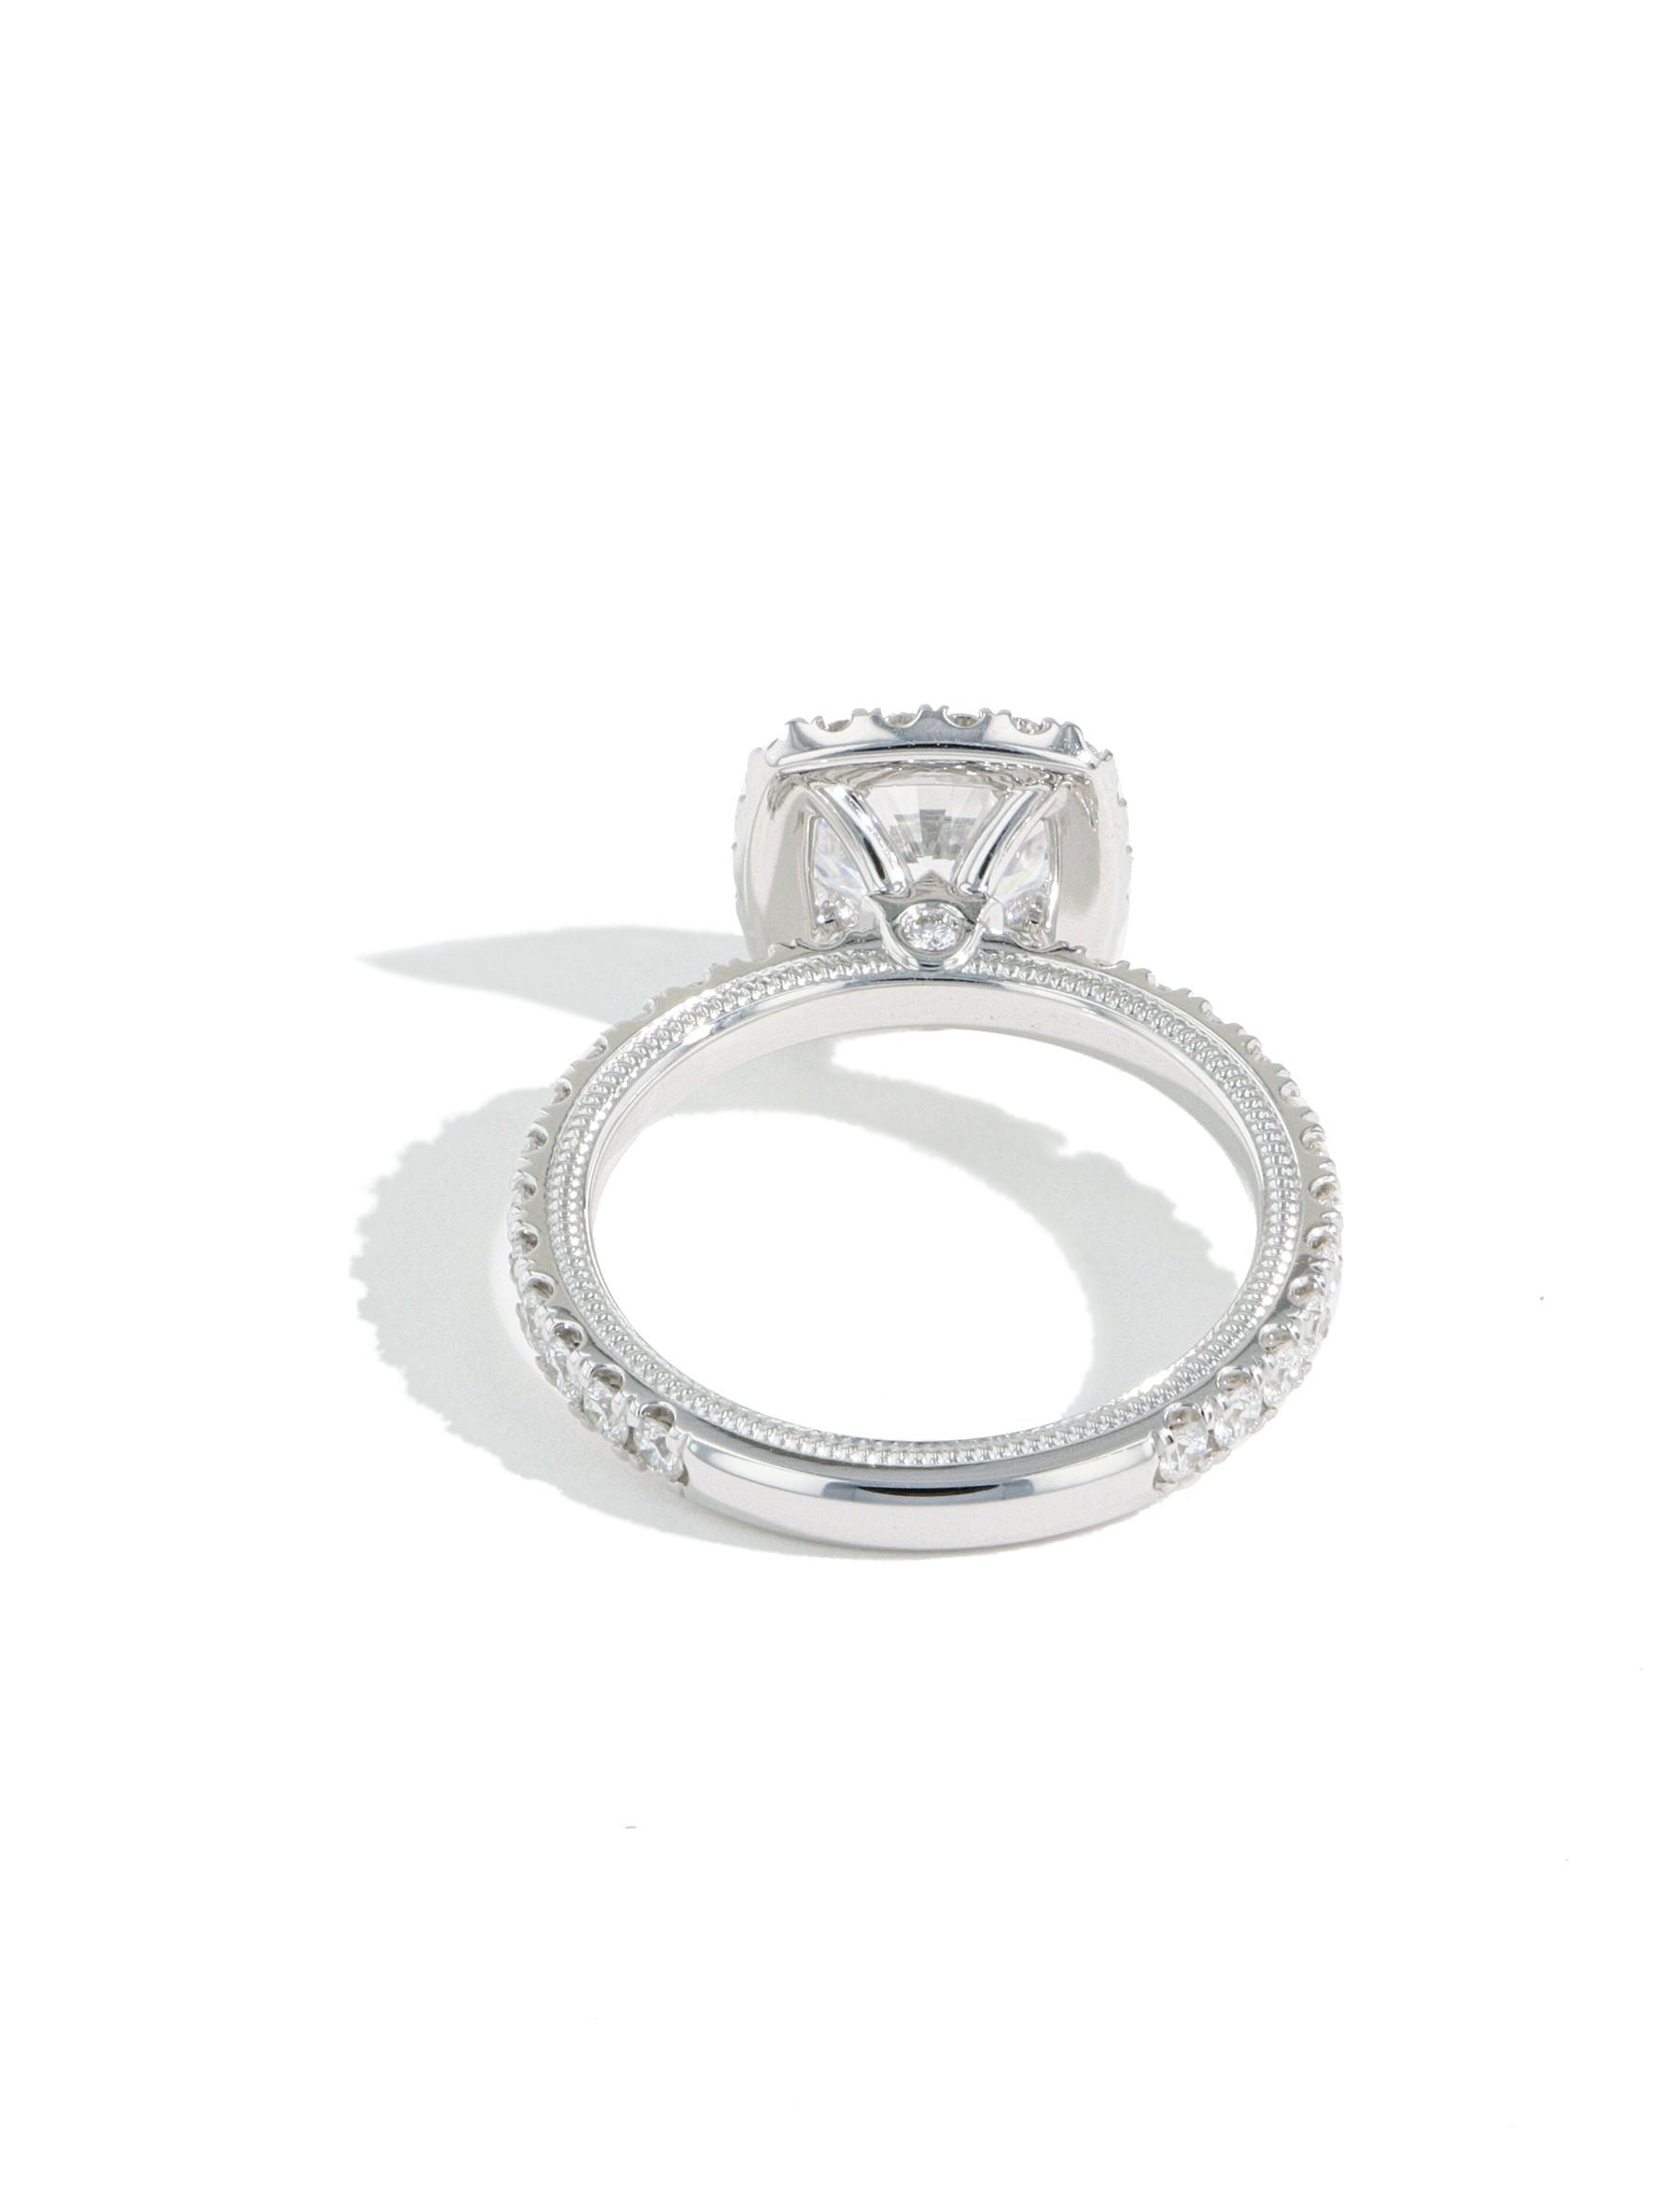 Verragio Tradition Round Diamond Cushion Halo Engagement Ring Setting back view